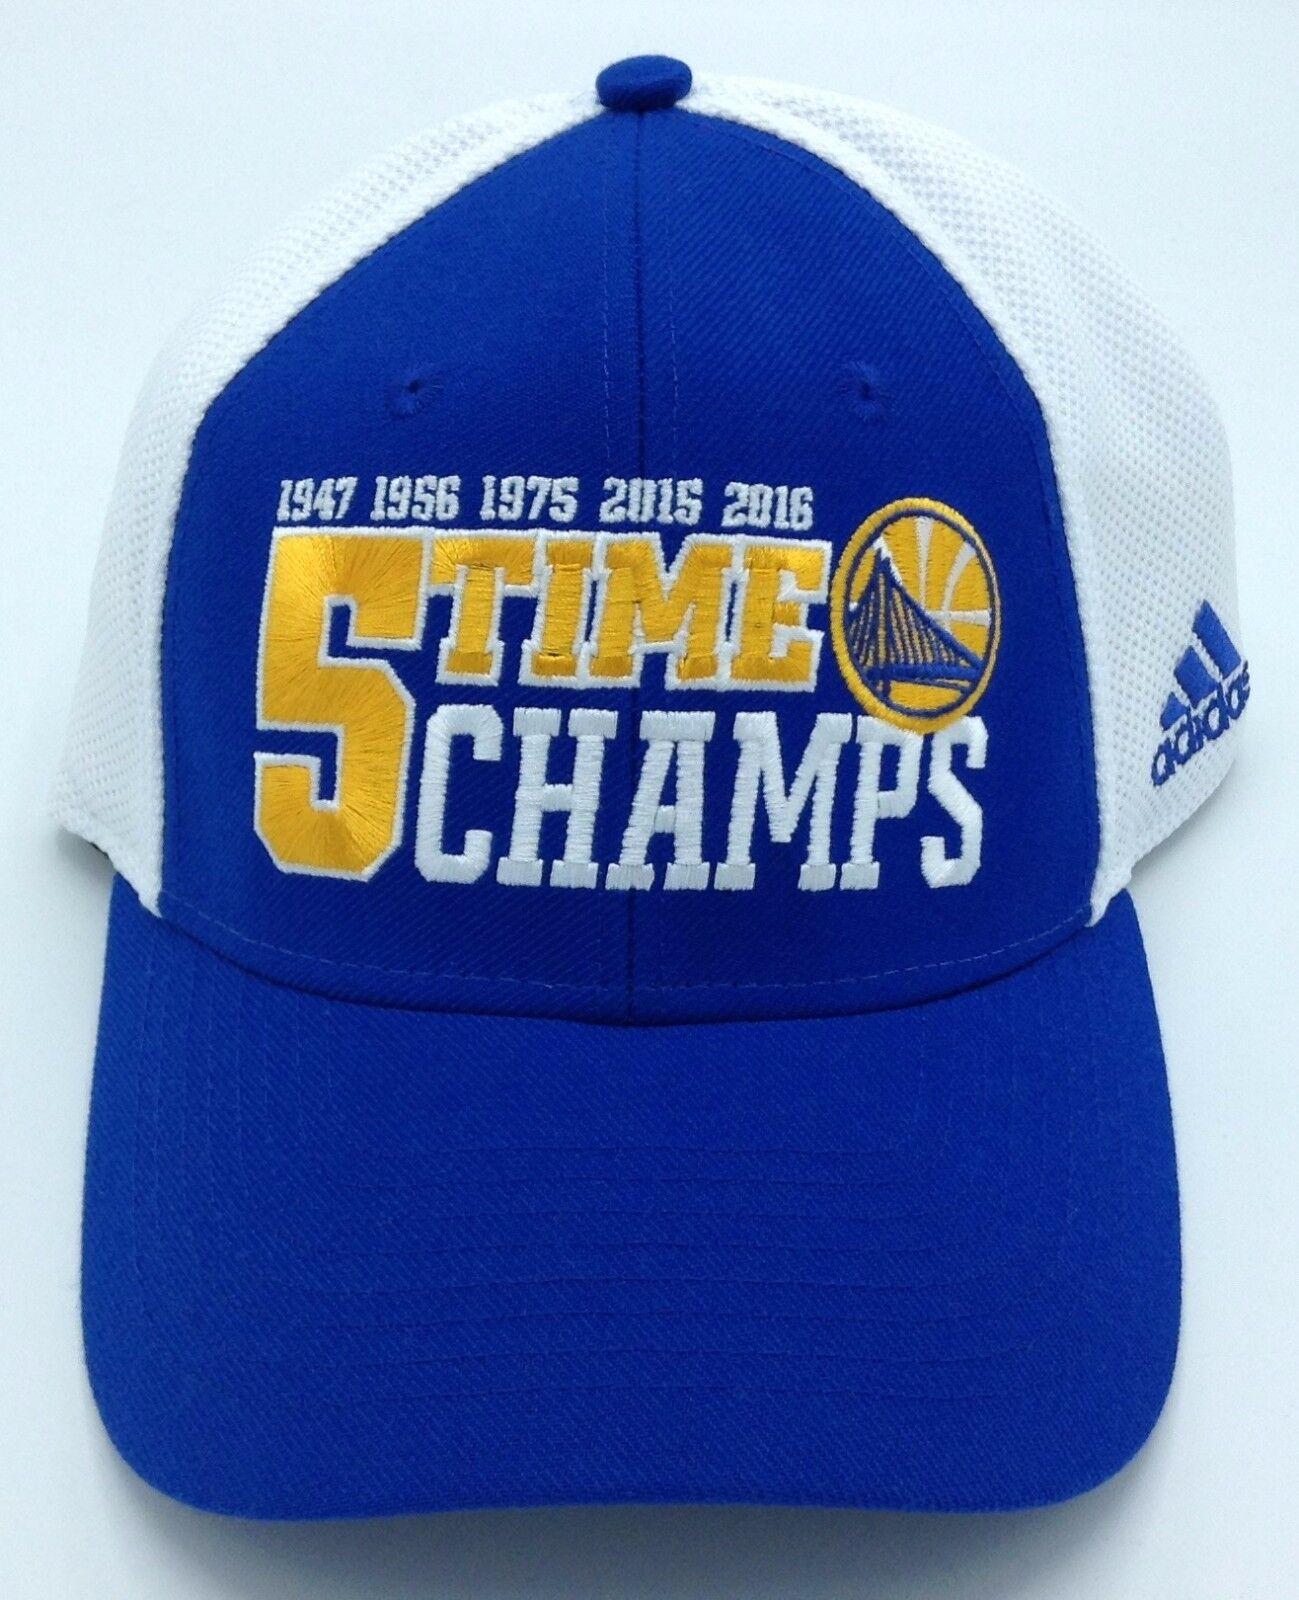 NBA Golden State Warriors Adidas Erwachsene 5x Championship Championship Championship Flex Fit Kappe Mütze ed7f0b